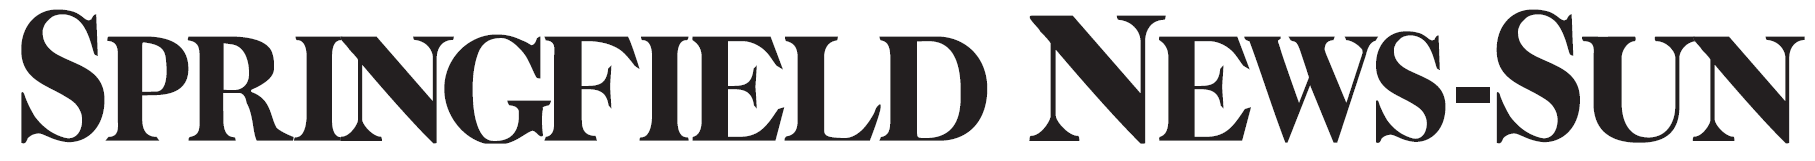 Springfield News-Sun